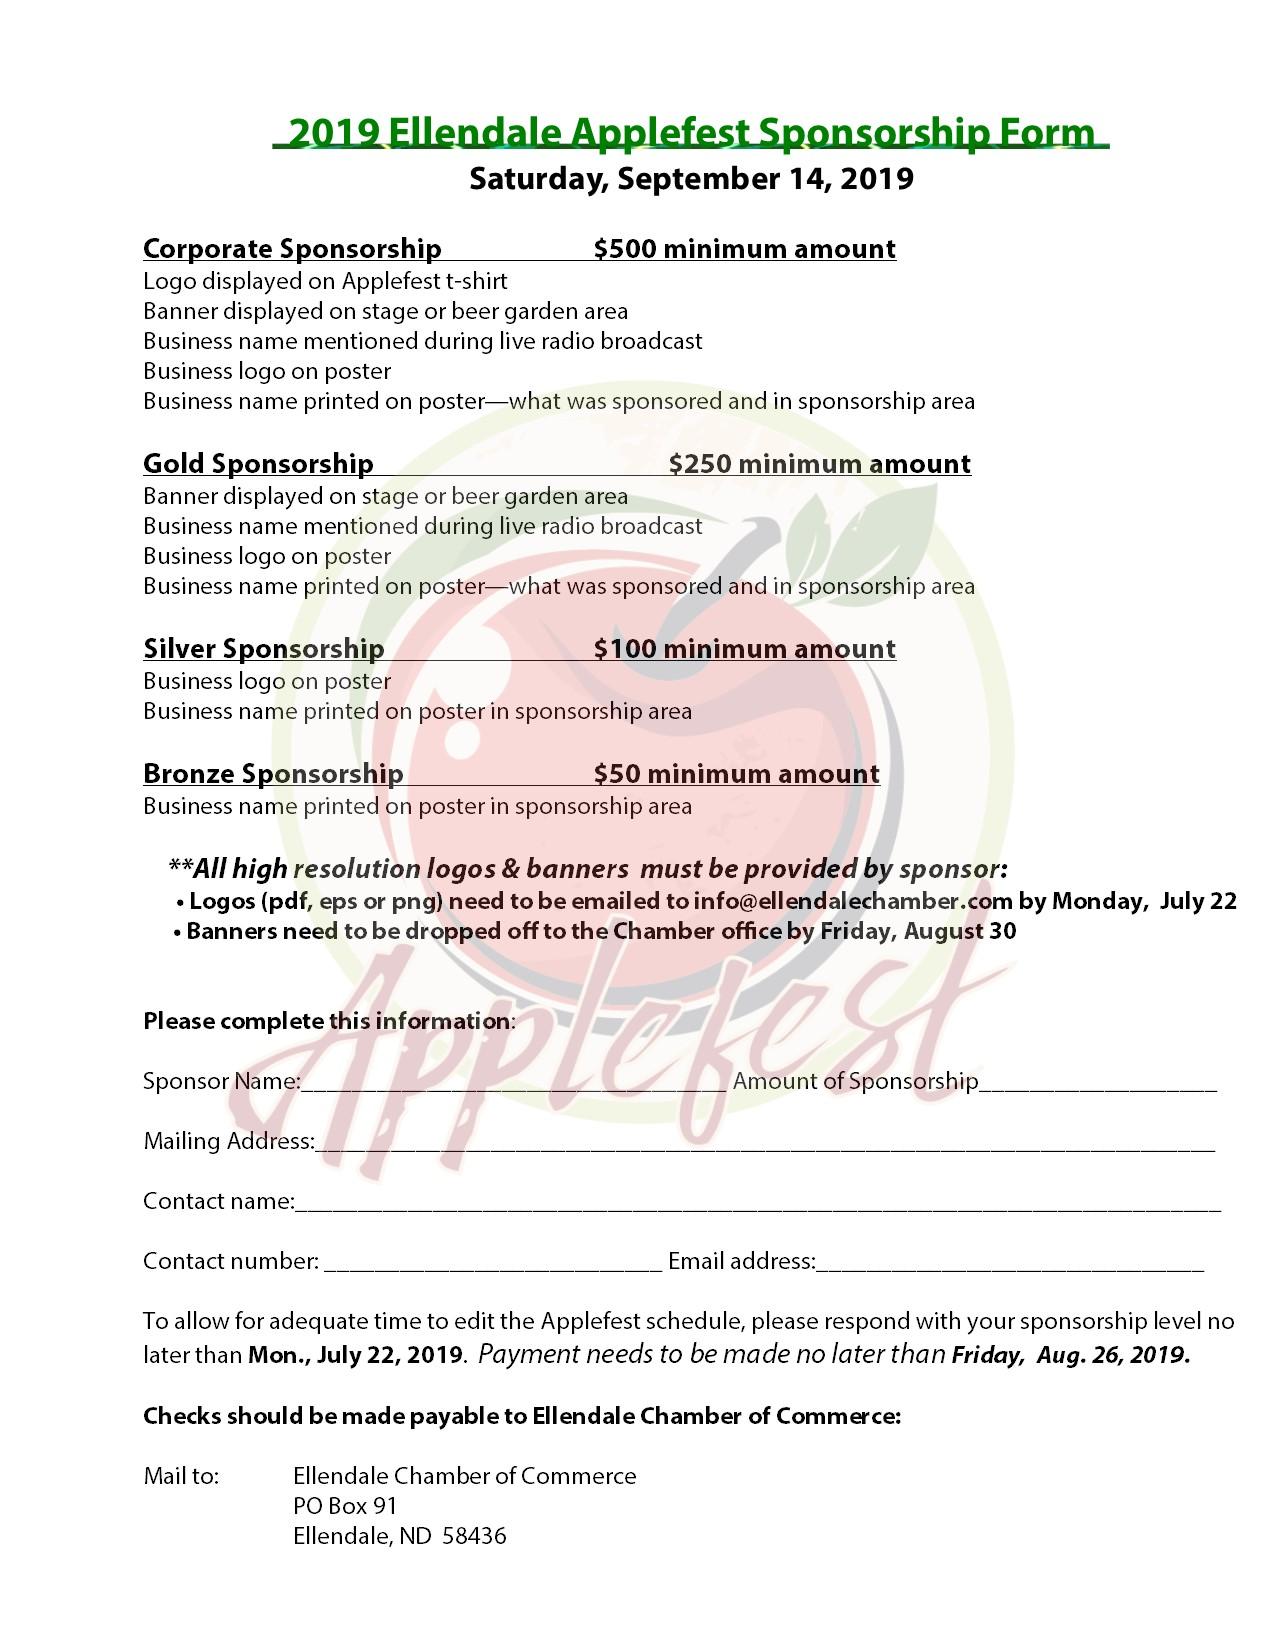 2019 Sponsorship Form